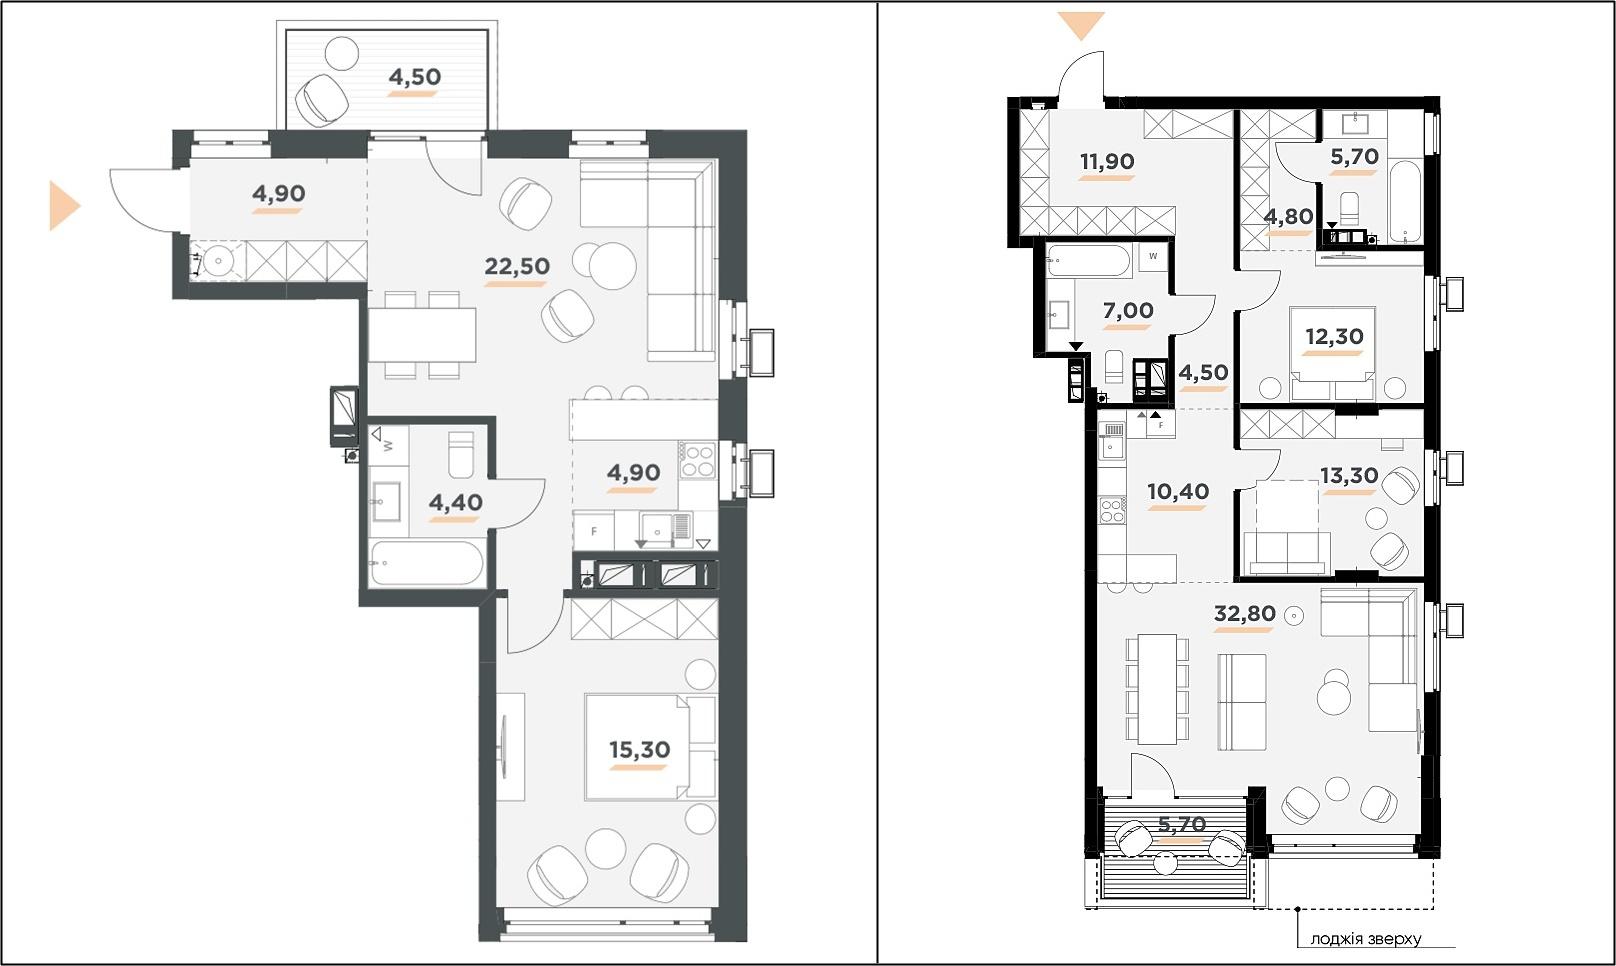 ЖК 31з варианты планировок квартир